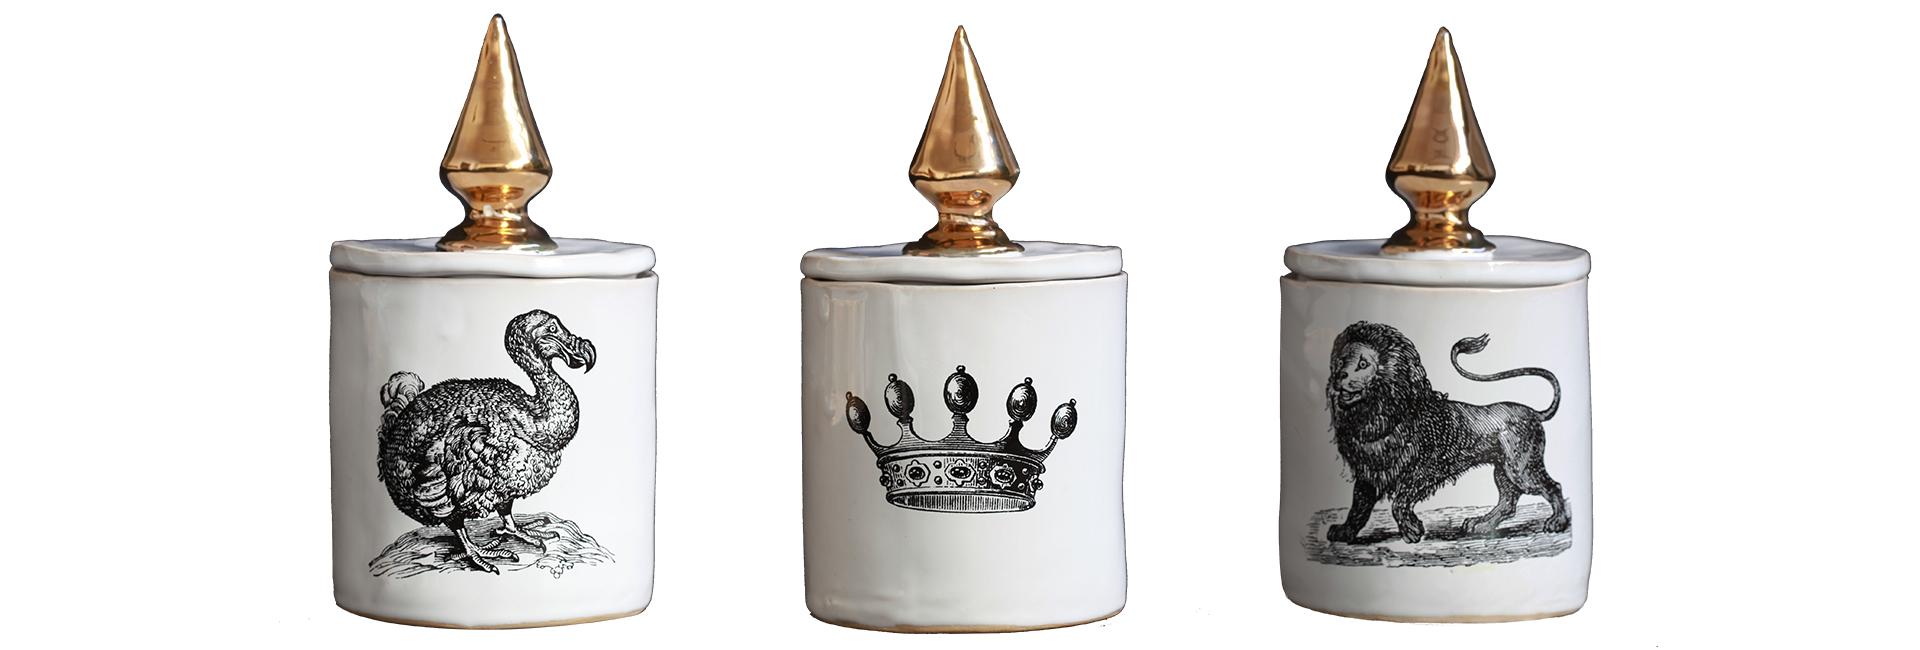 Première collection de bougies pour Apothecary Modern